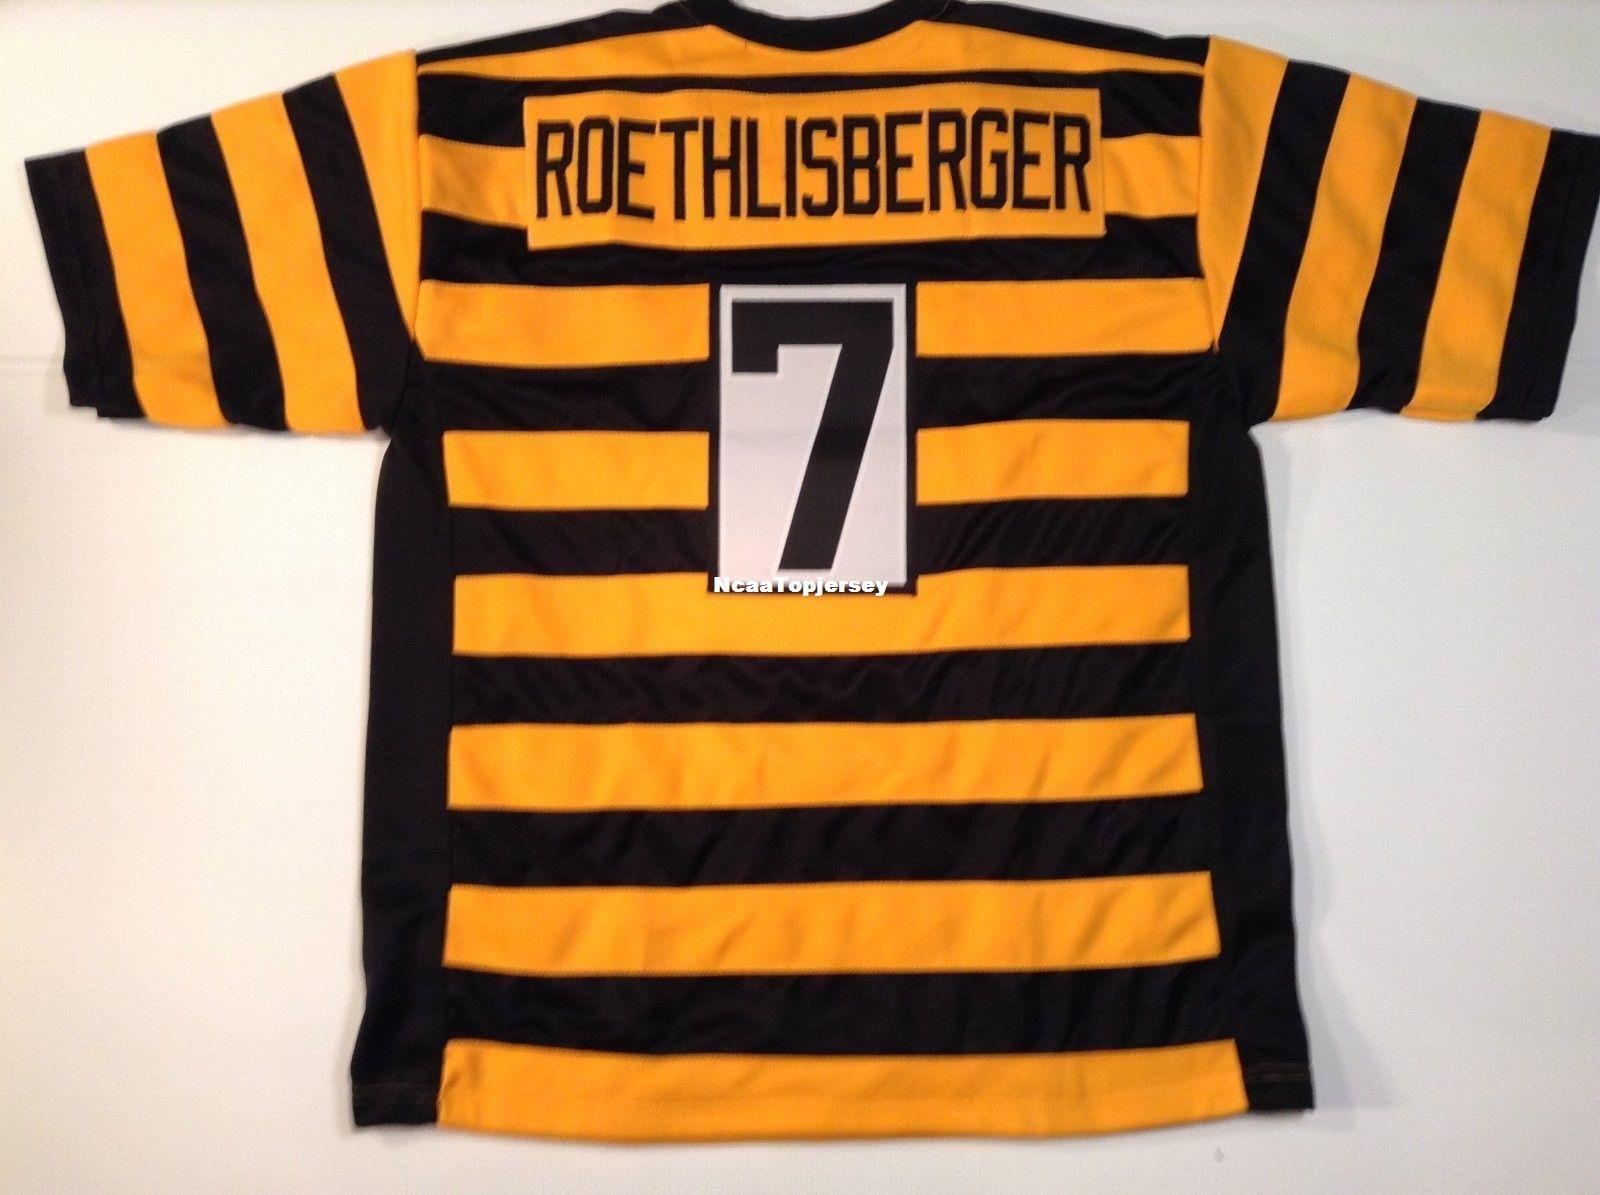 quality design e240c e67c8 official store ben roethlisberger bumblebee jersey 1a31e a0dd6